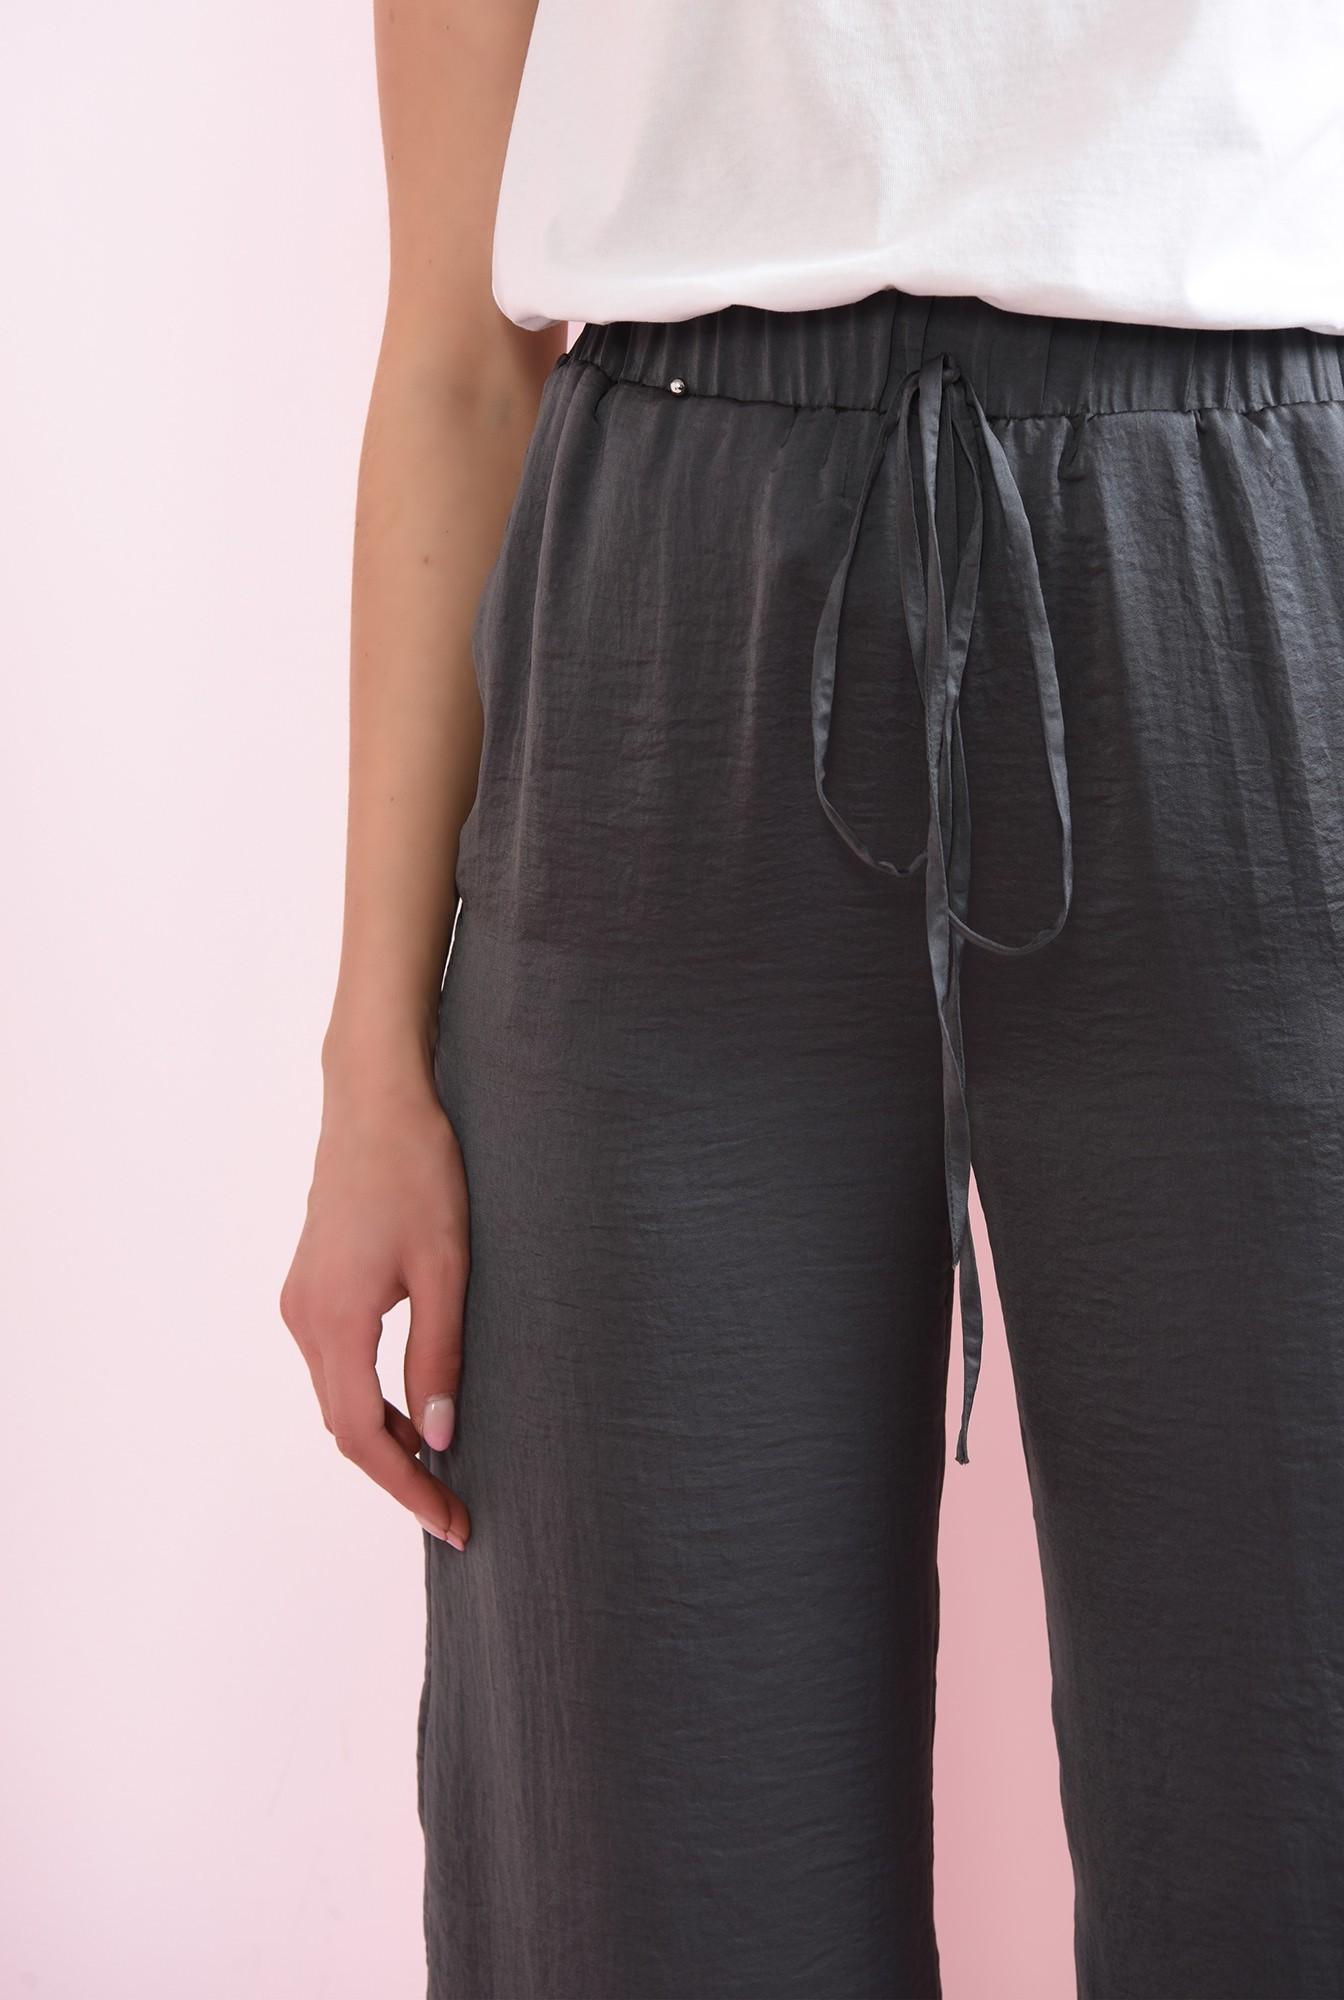 2 -  pantaloni gri, din satin, evazati, cu snur